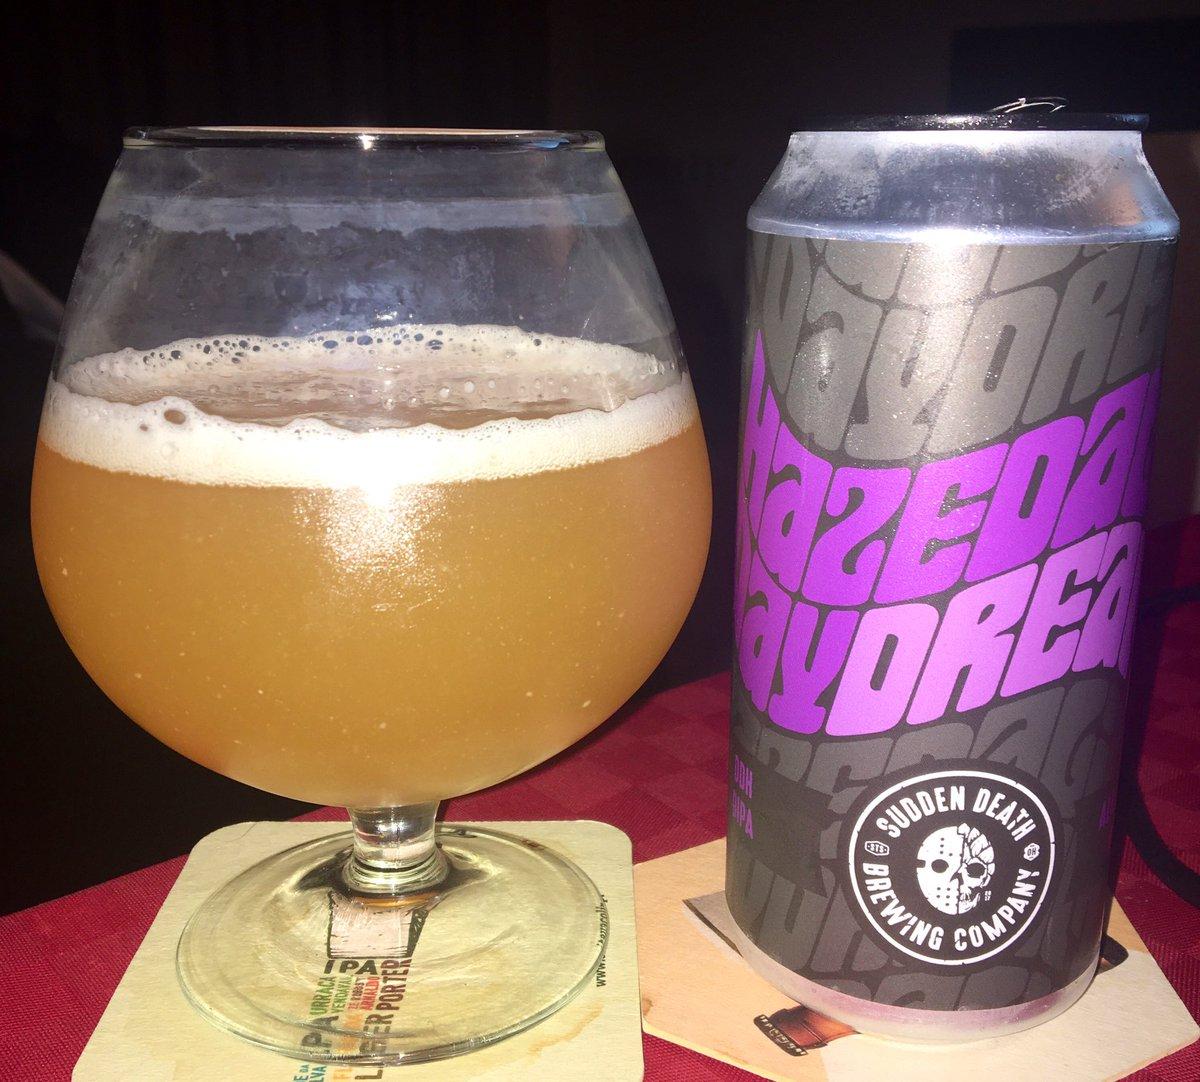 Hazedelic Daydream Sudden Death Brewing Co (Alemanha ) @suddendeathbrew  Double Imperial IPA; 8% ABV #CraftBeer #cervejaartesanal pic.twitter.com/PwlWWrE9sd